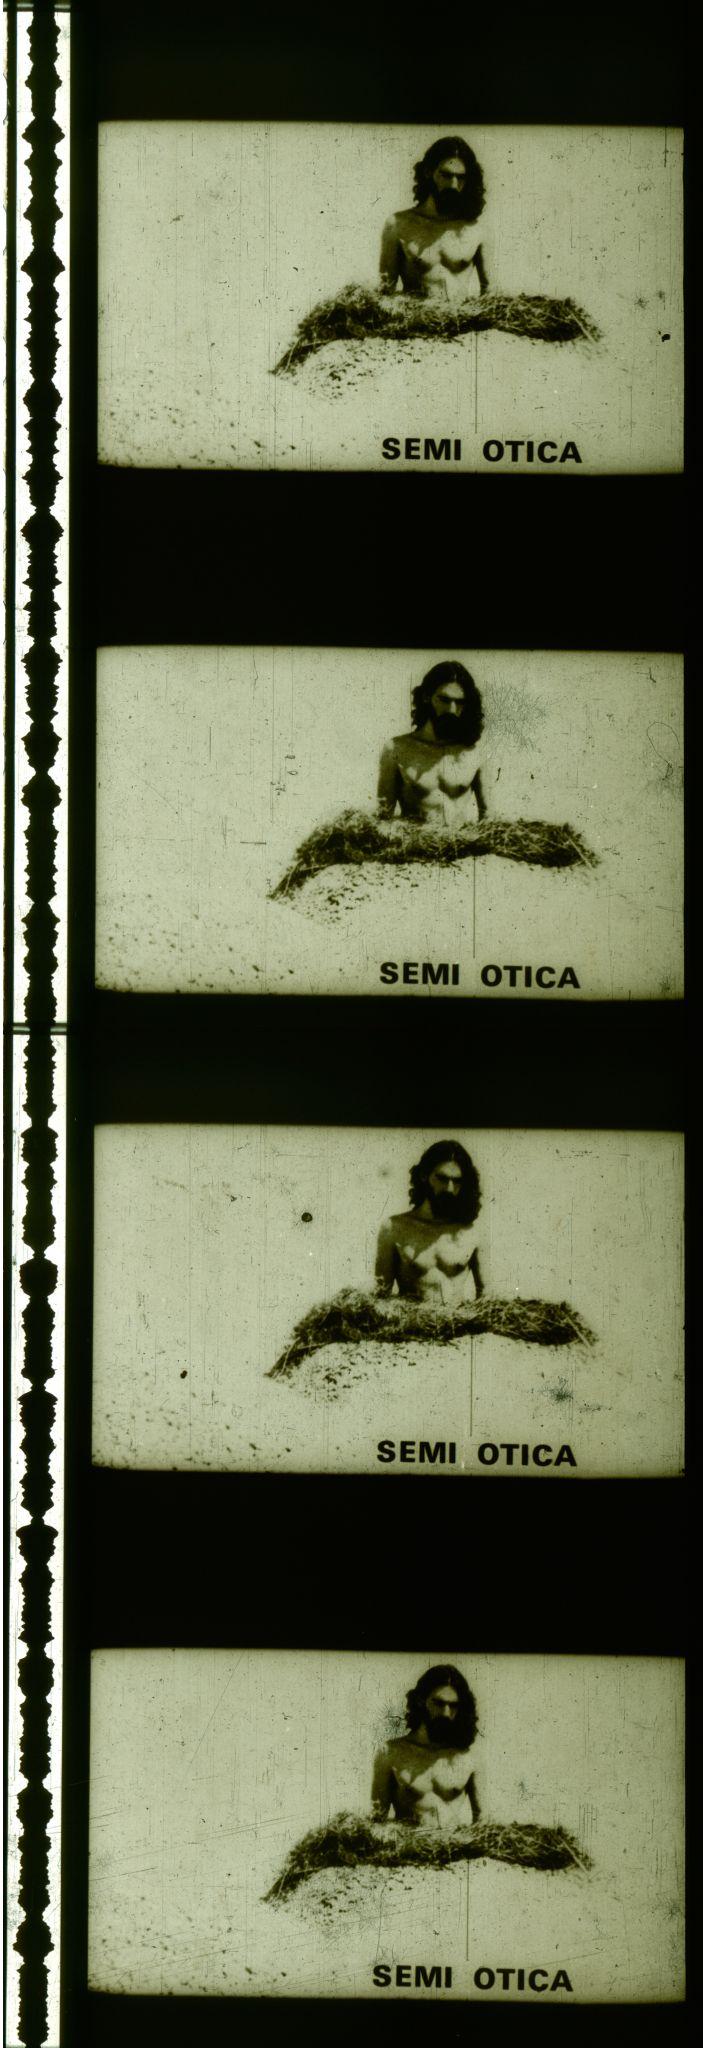 Semi ótica, 1975, Antonio Manuel